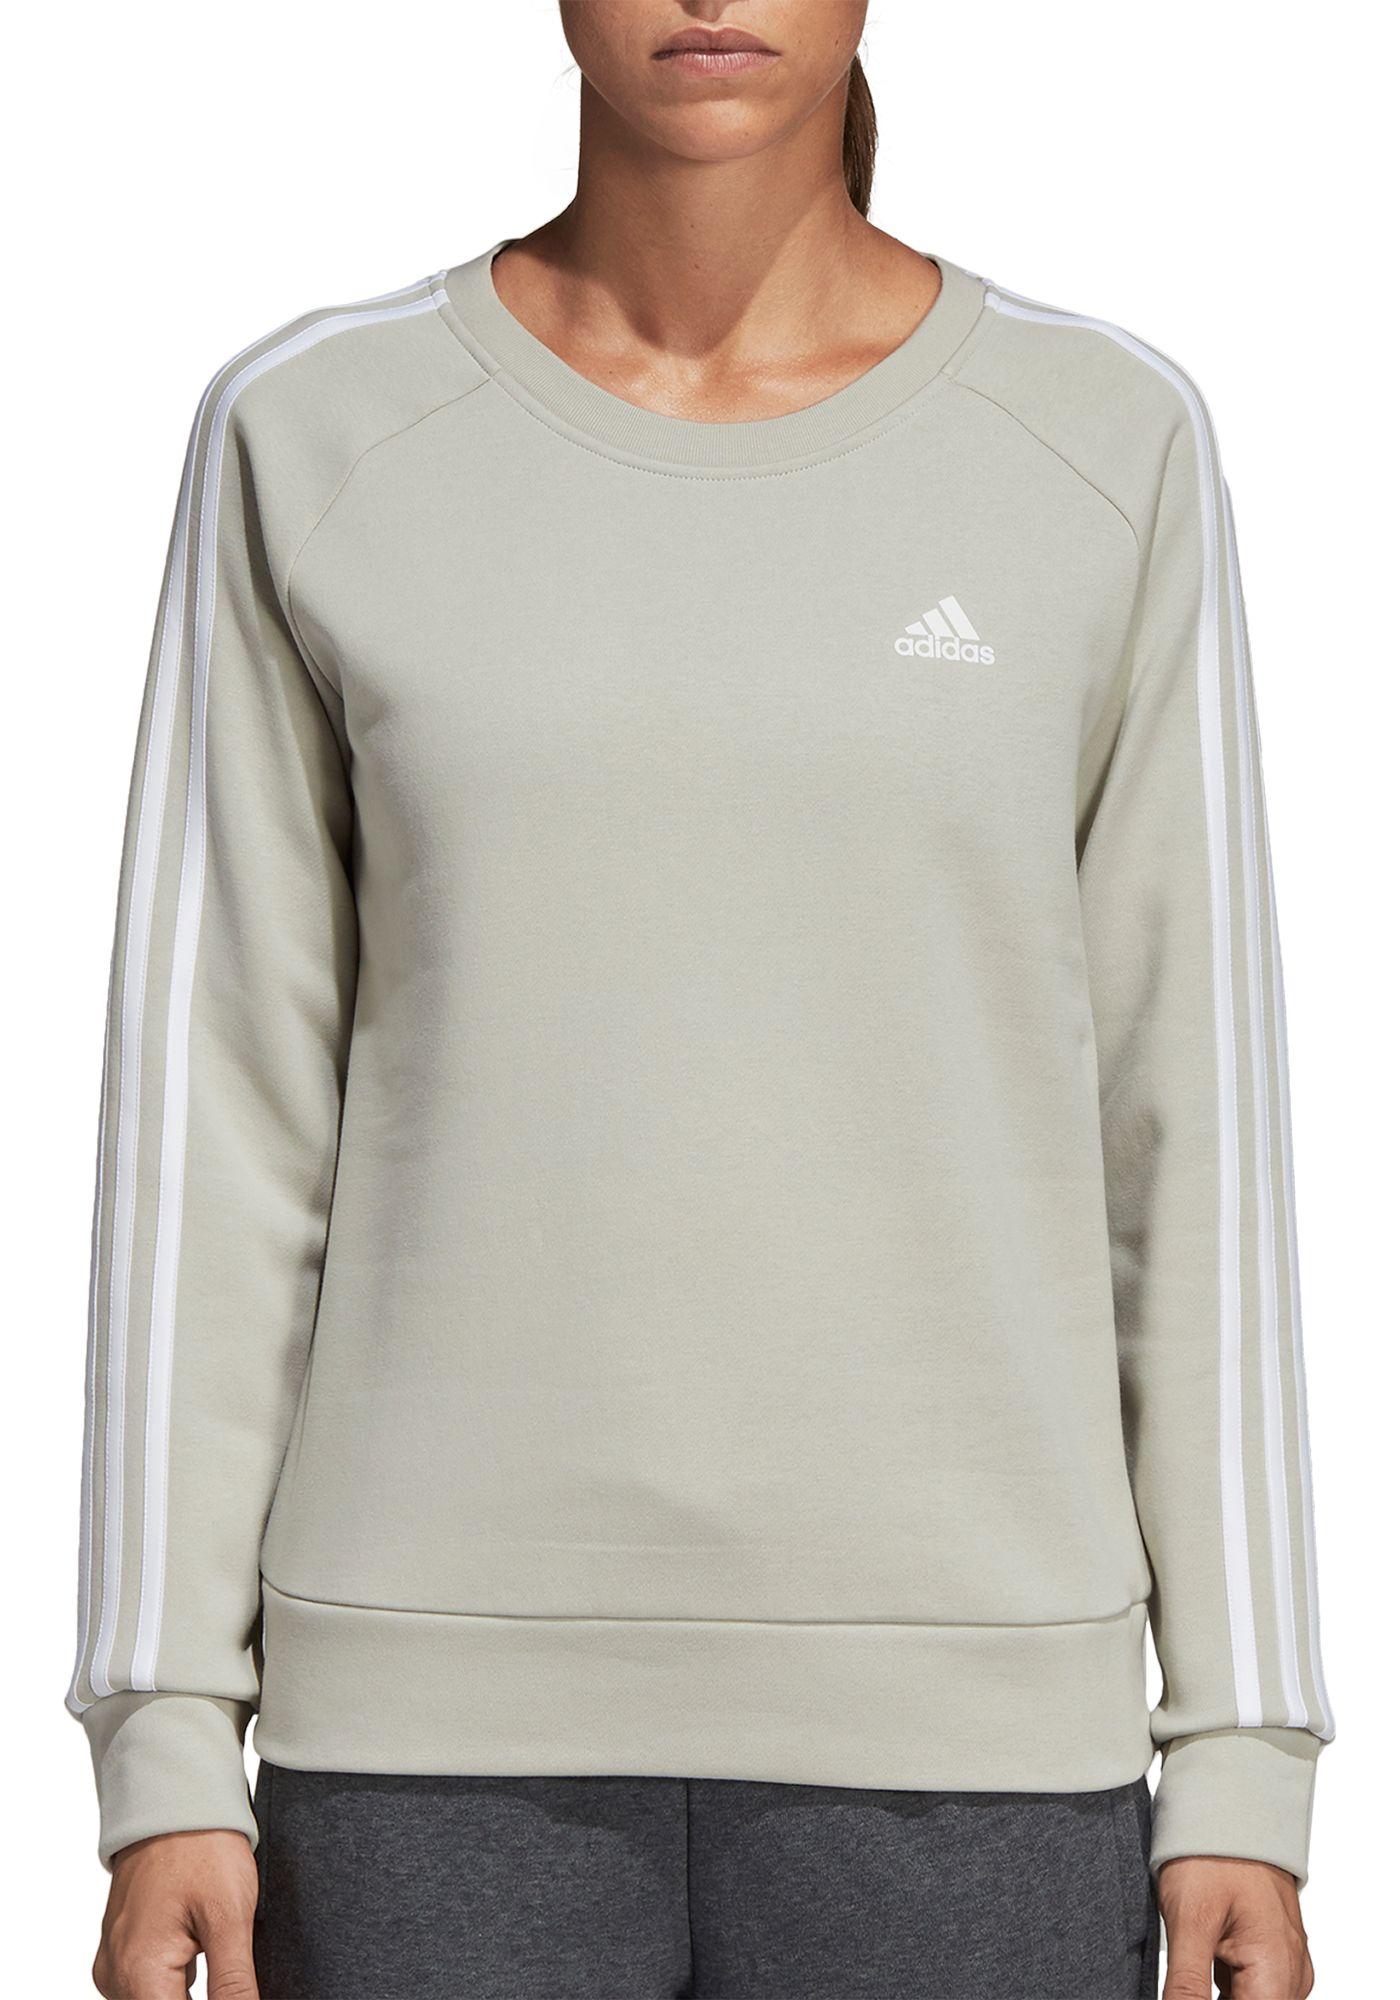 adidas Women's Essentials 3-Stripes Crewneck Sweatshirt